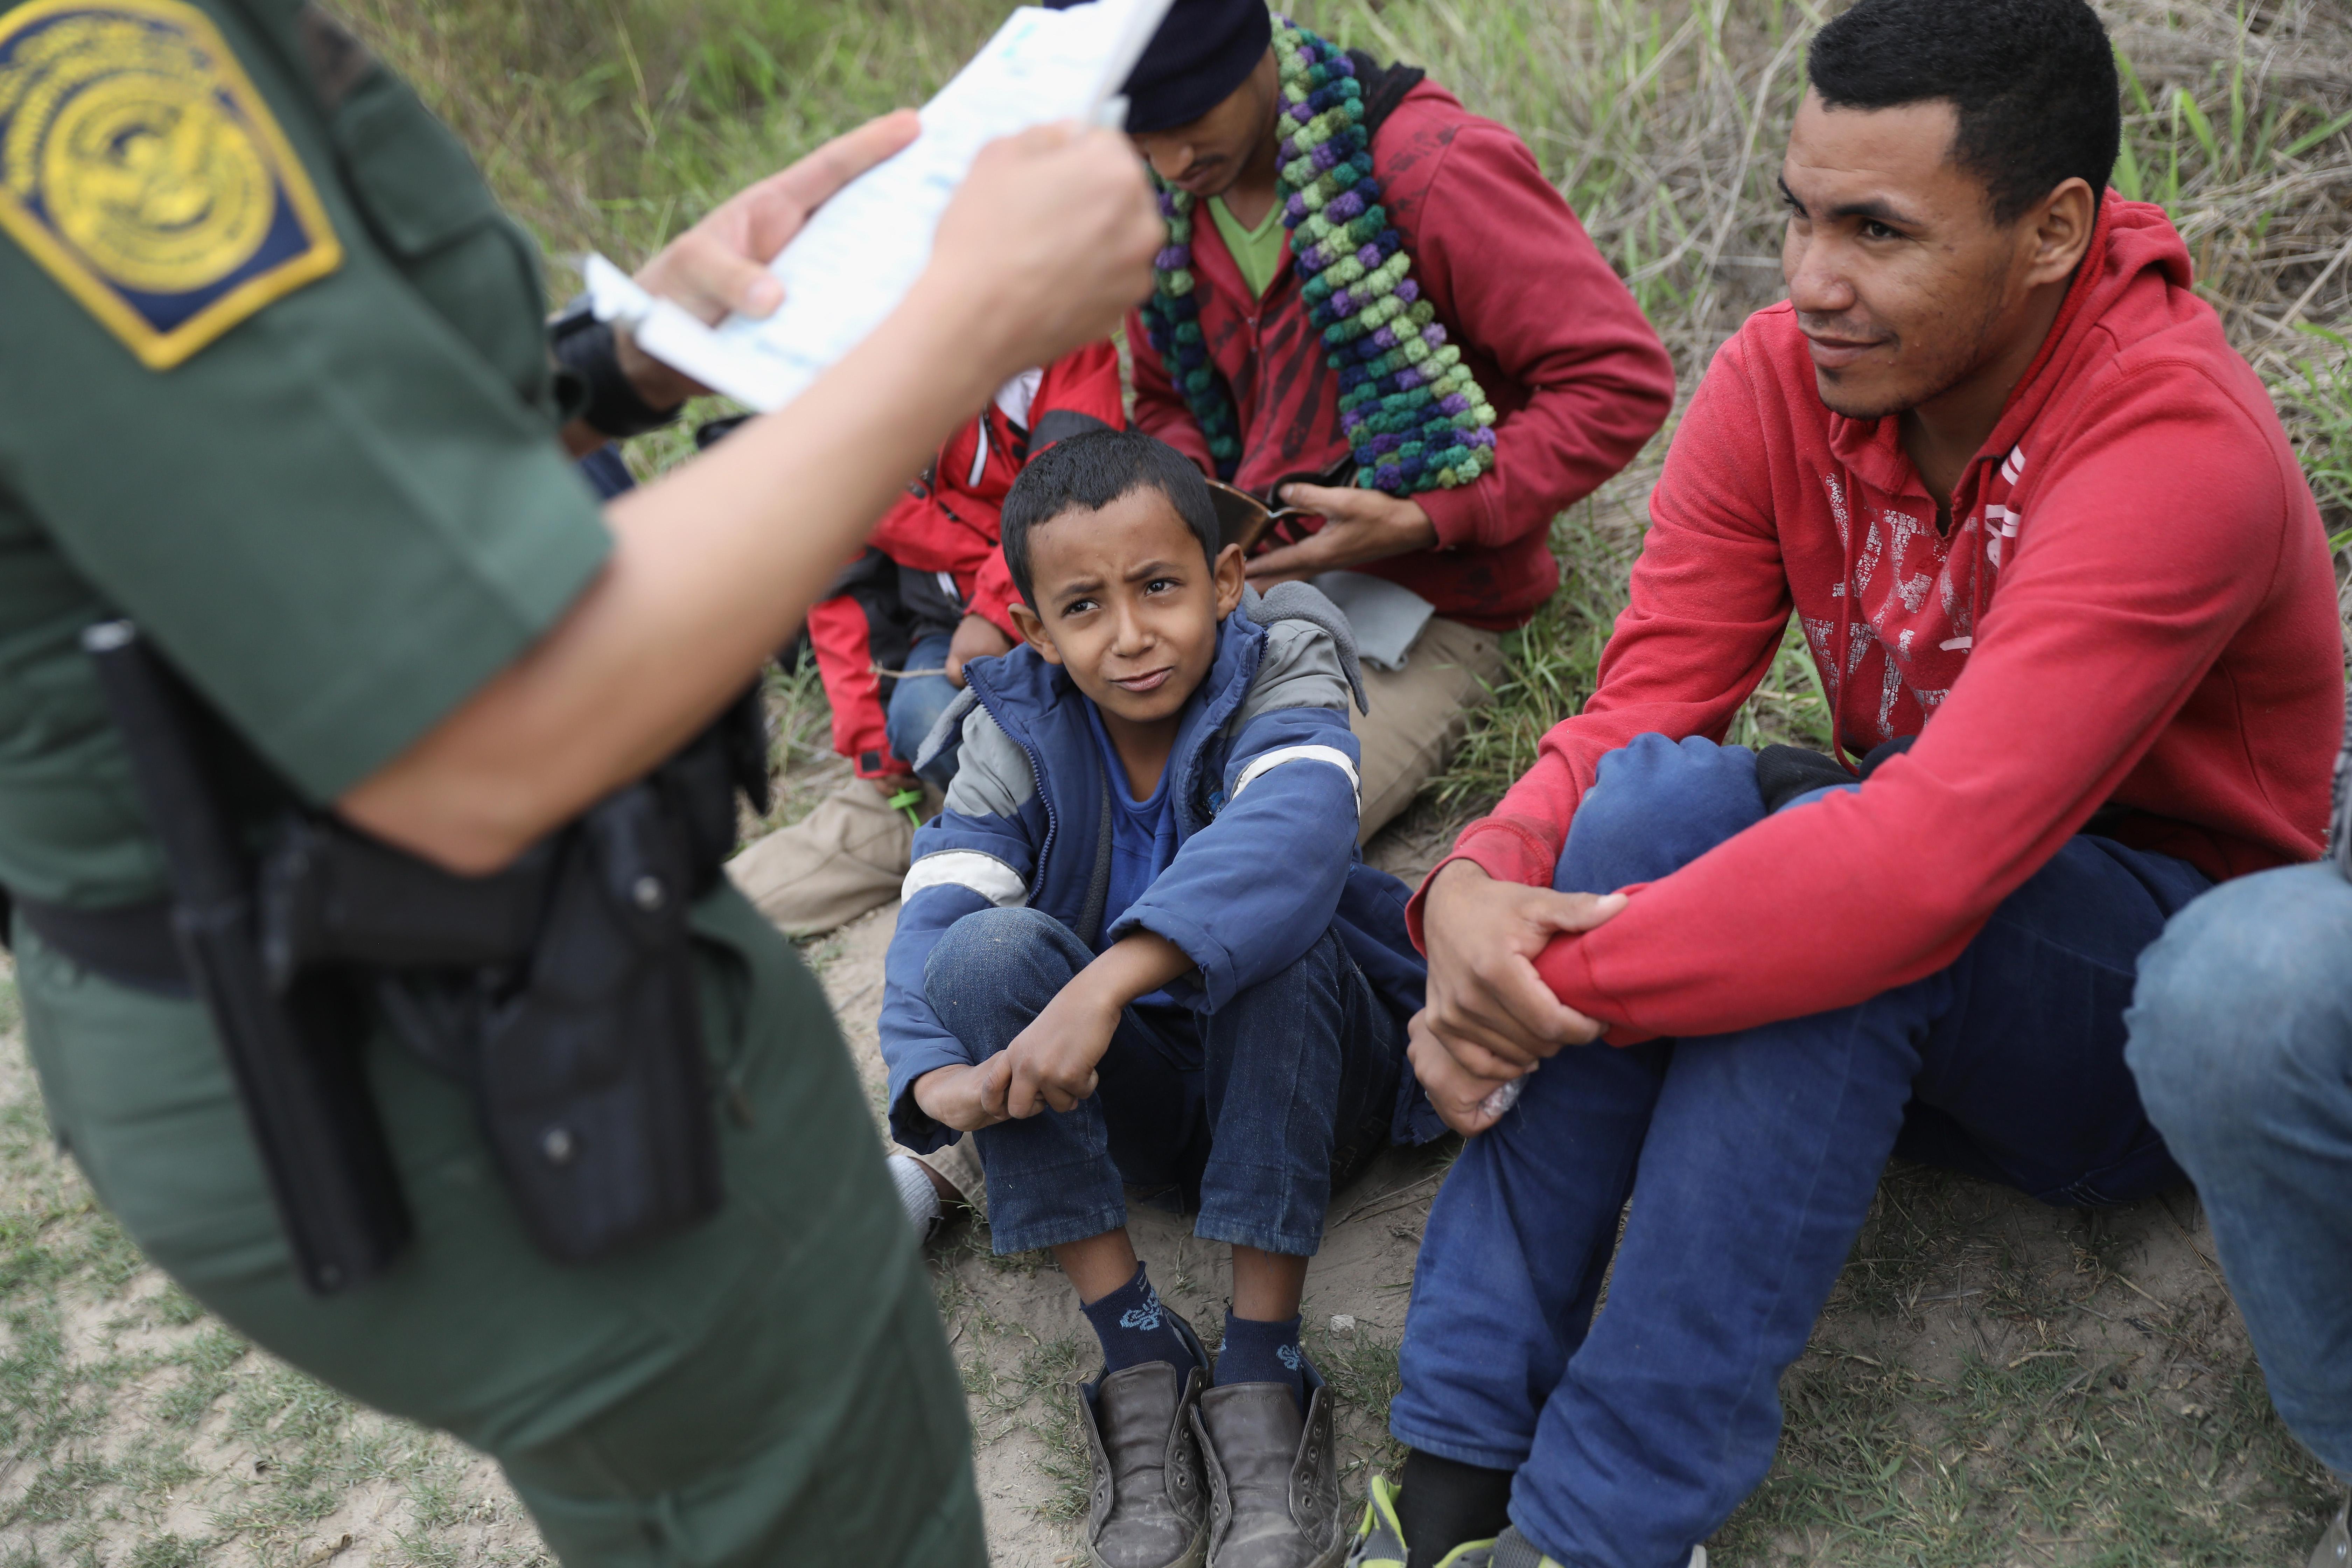 Immigrants Surge Across Border Ahead Of Trump Inauguration